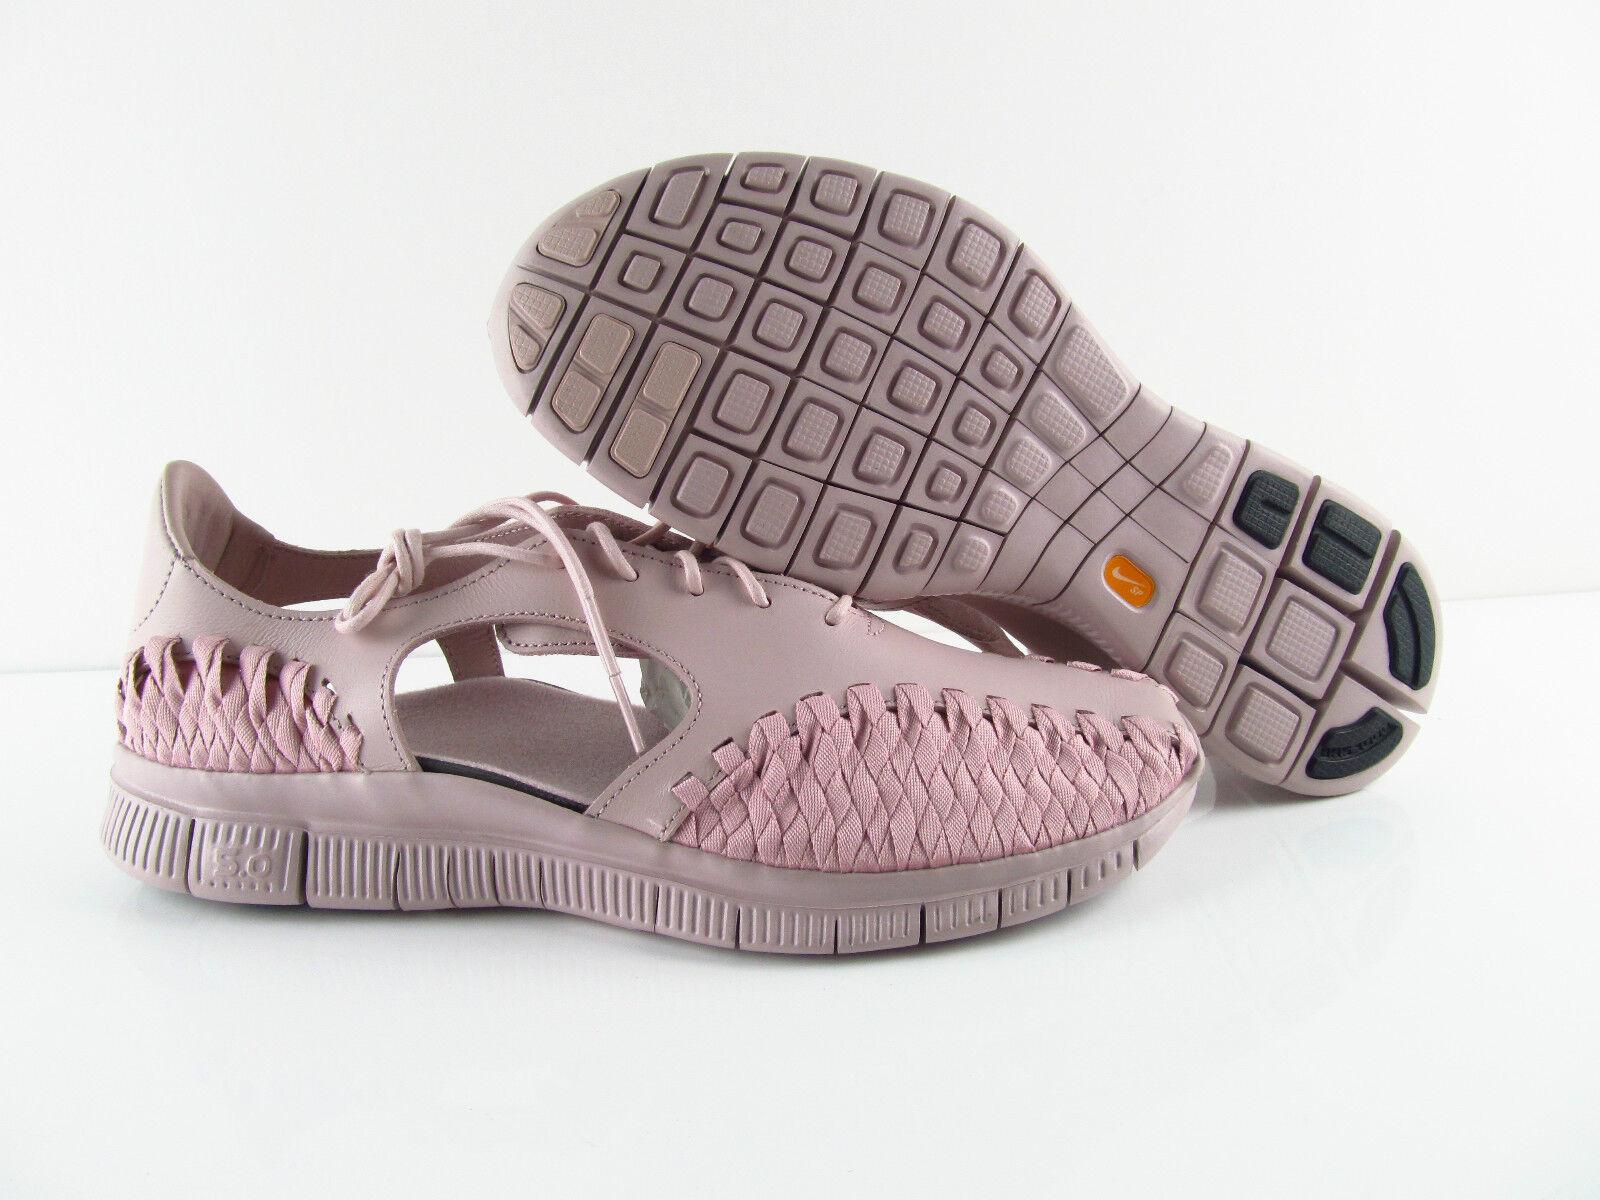 Nike Free Inneva Nikelab Woven Pink 813069 660 US_7- US_7- US_7- 7.5 - 10 Eur 38 - 38.5 - 42 4ab908